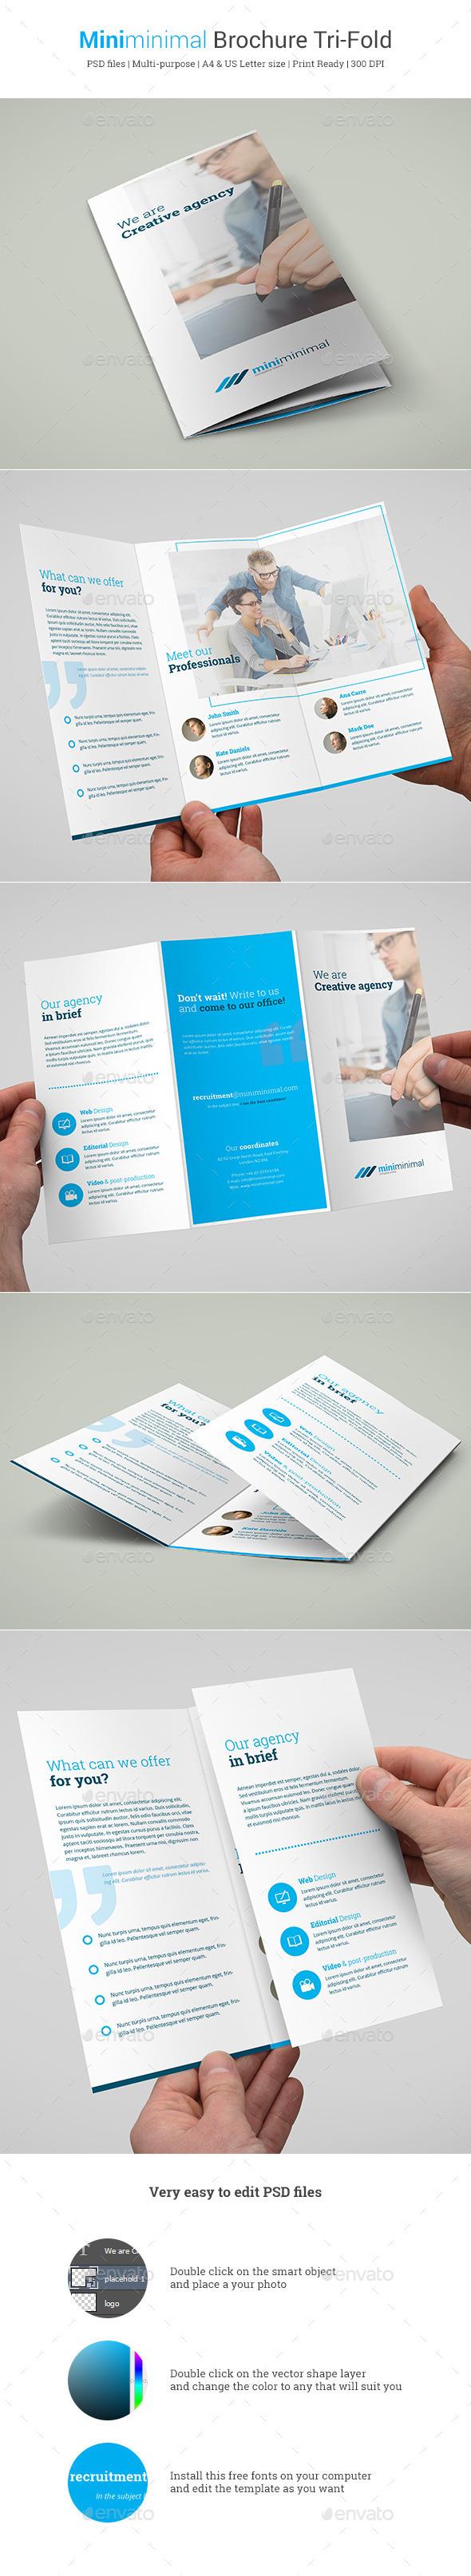 GraphicRiver Miniminimal Brochure Tri-Fold 10472350